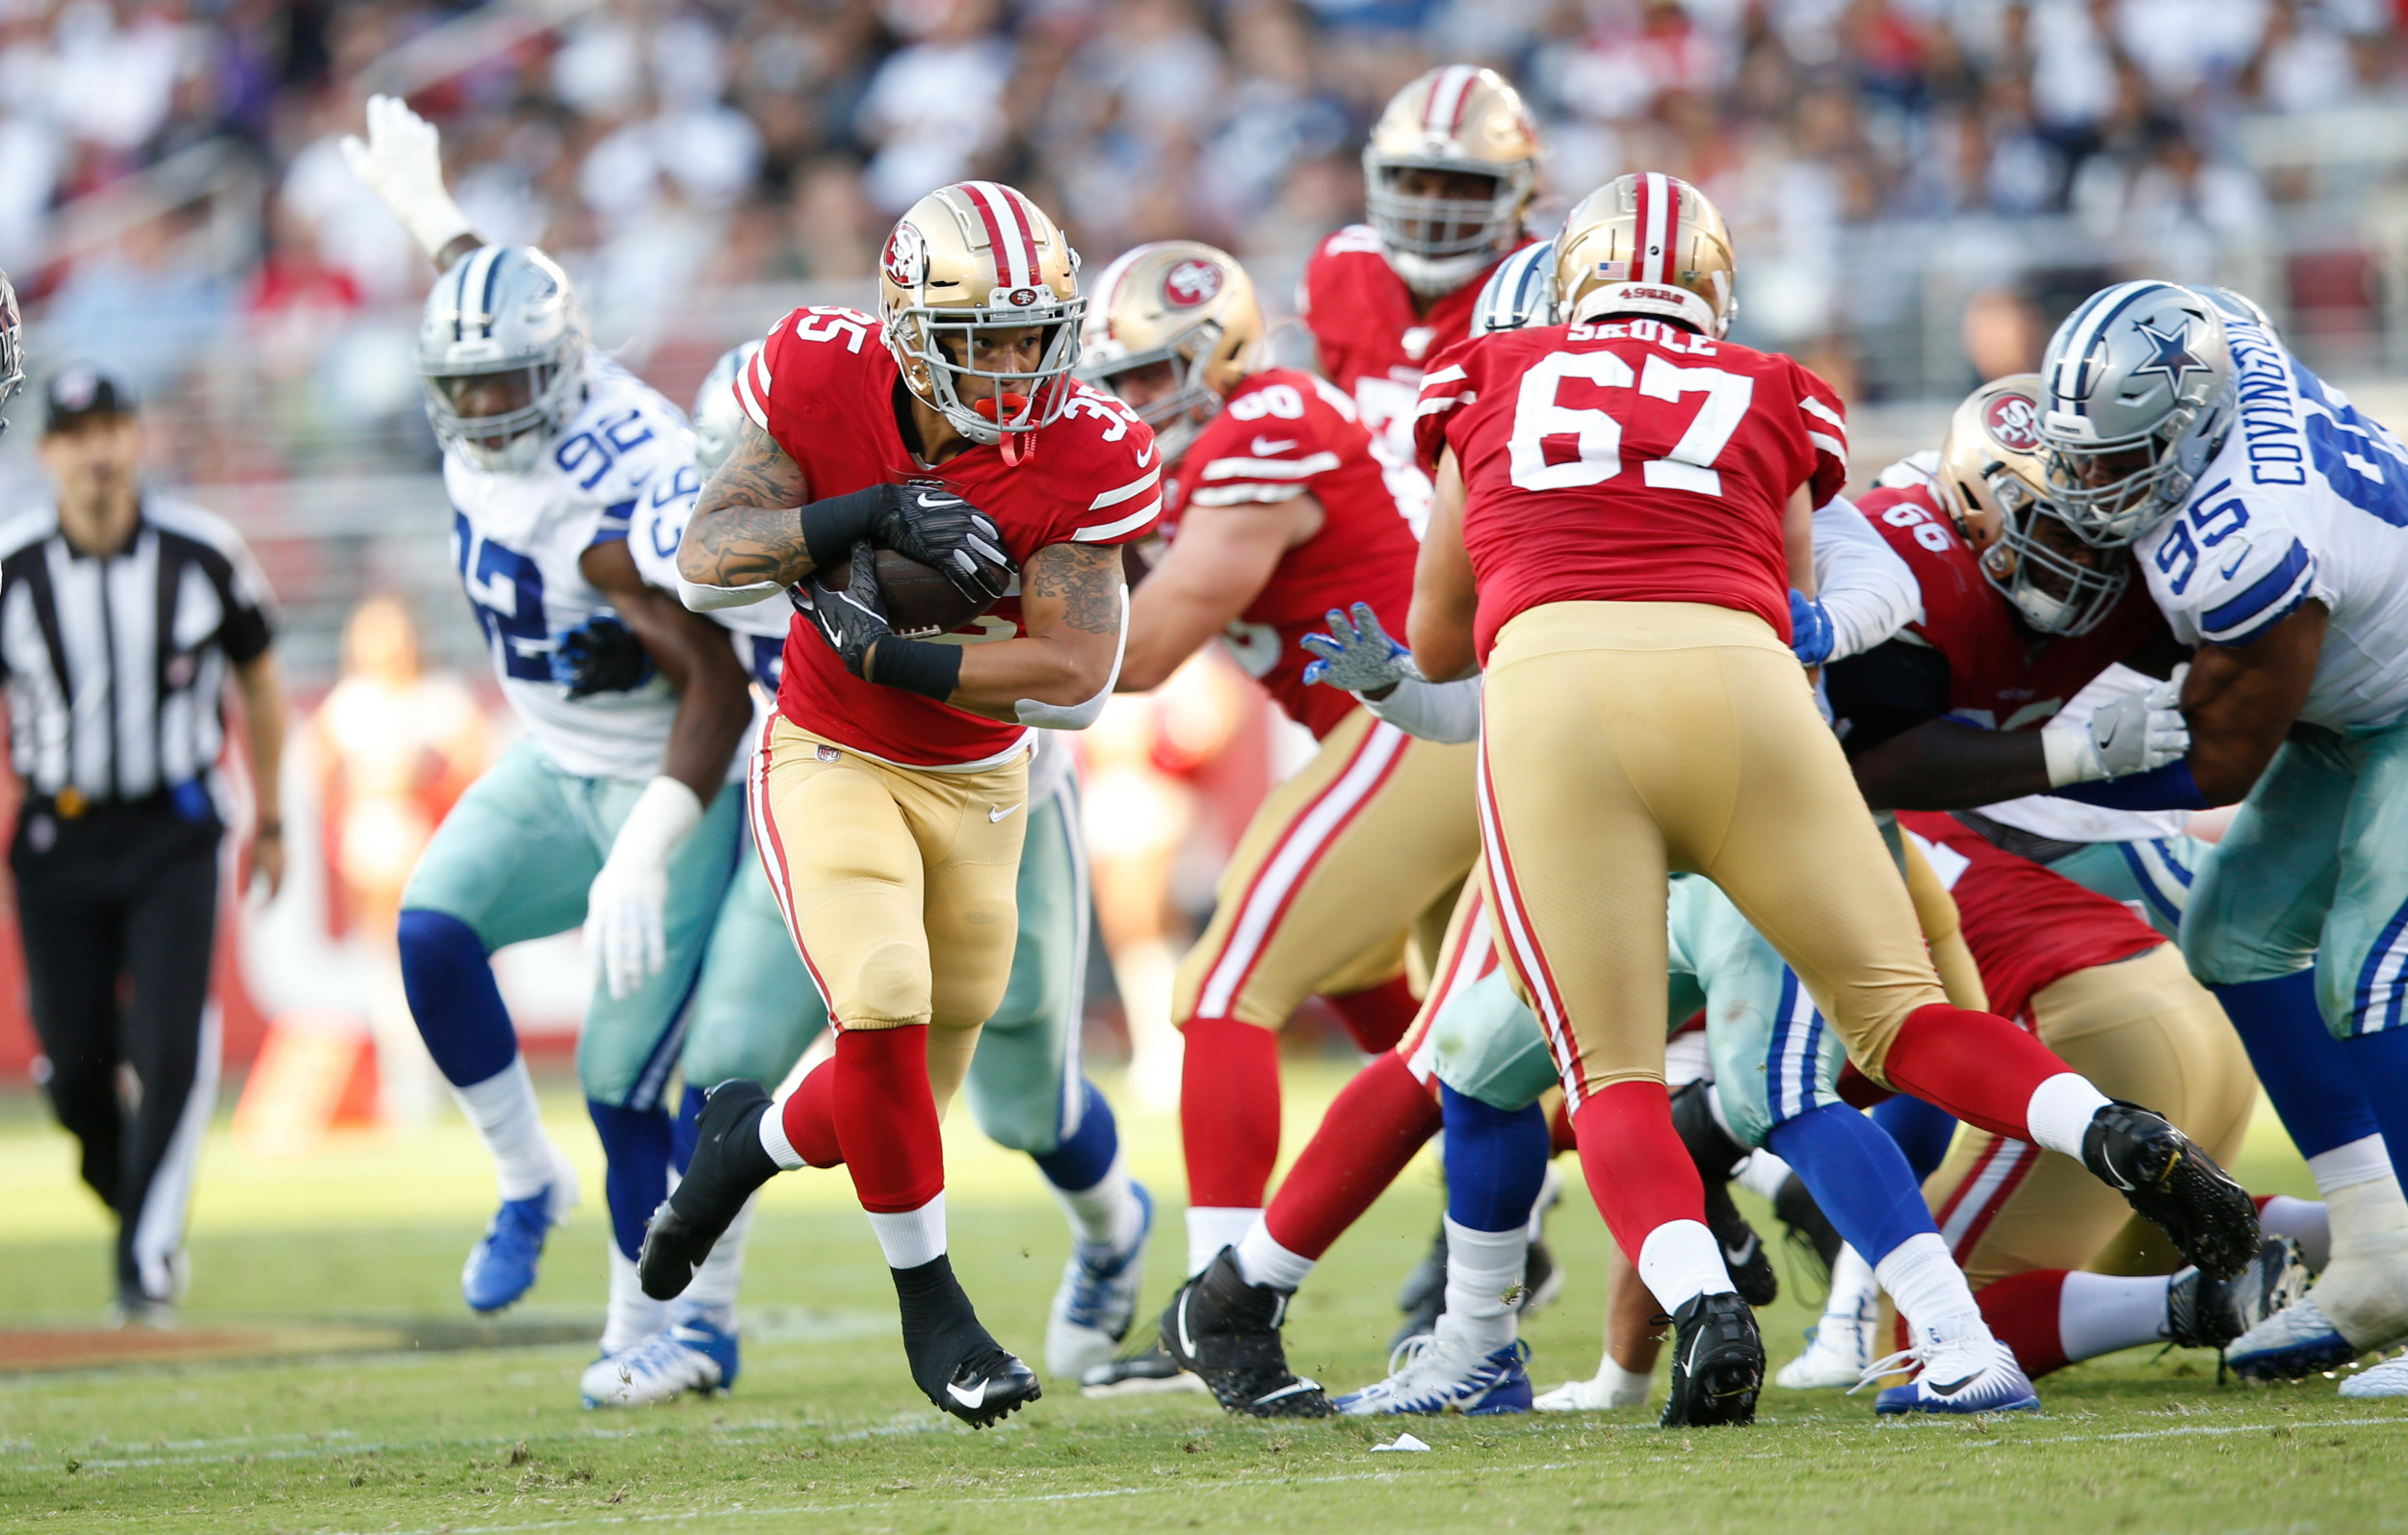 2aced49b NFL Preseason: Where to Watch San Francisco 49ers vs. Denver Broncos ...